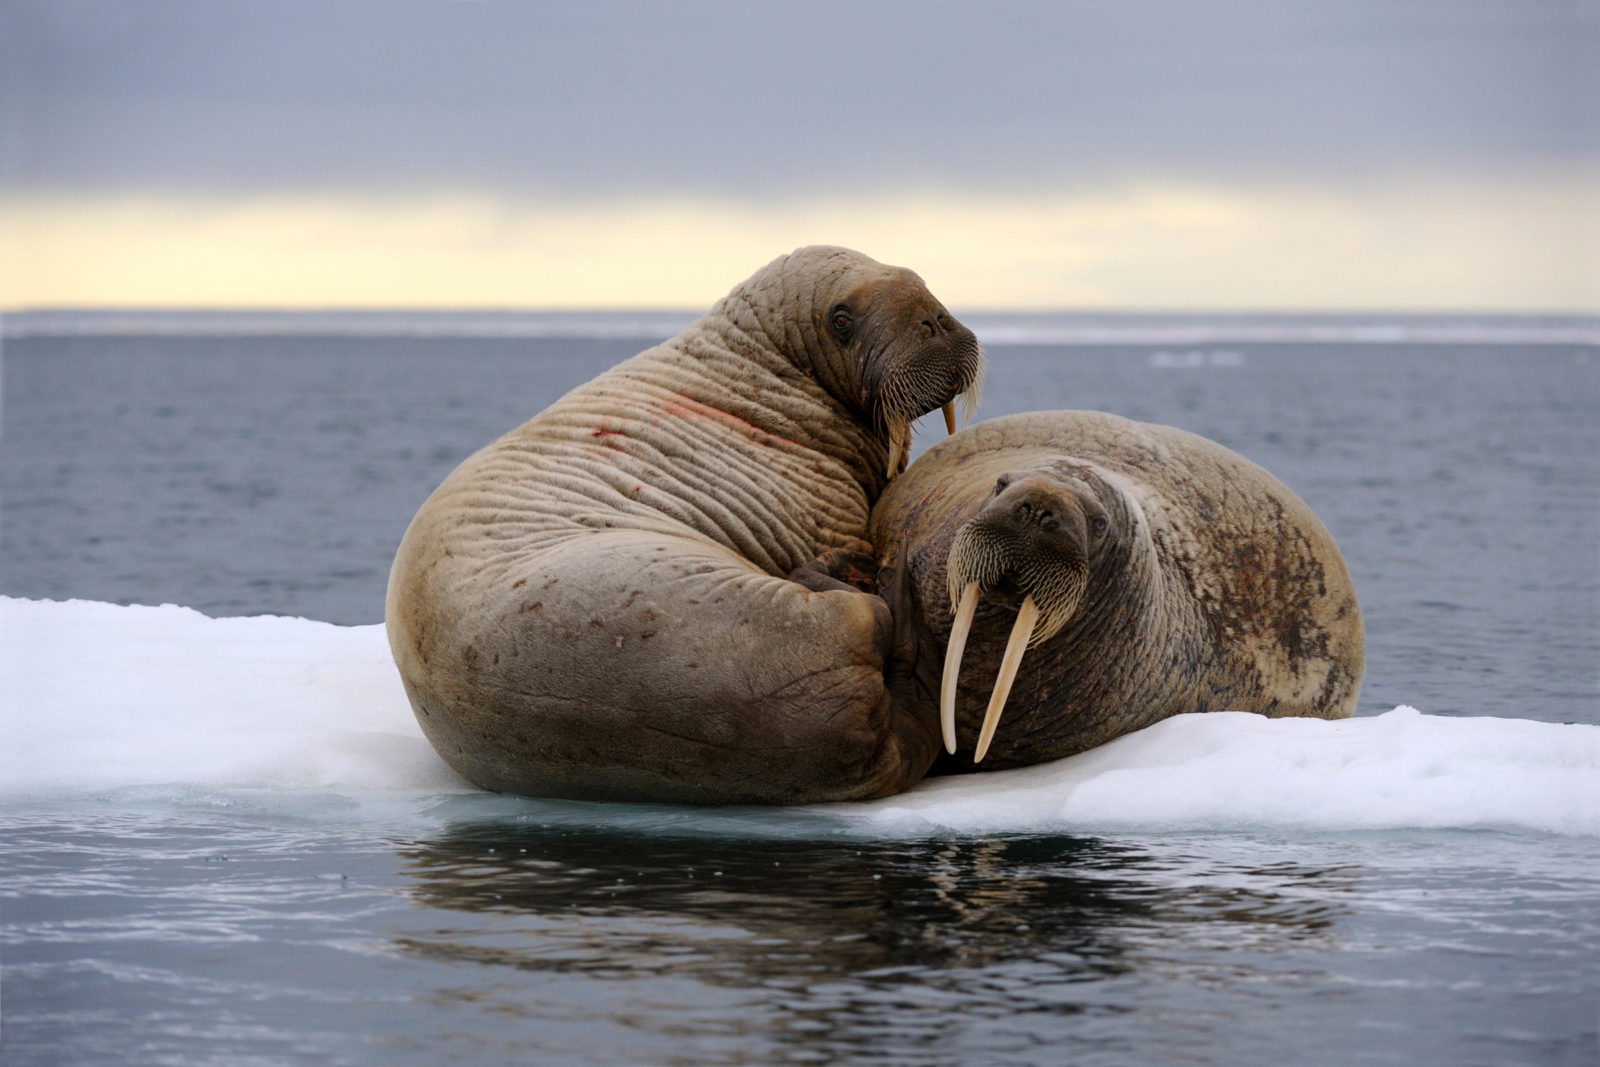 © naturepl.com / Eric Baccega / WWF